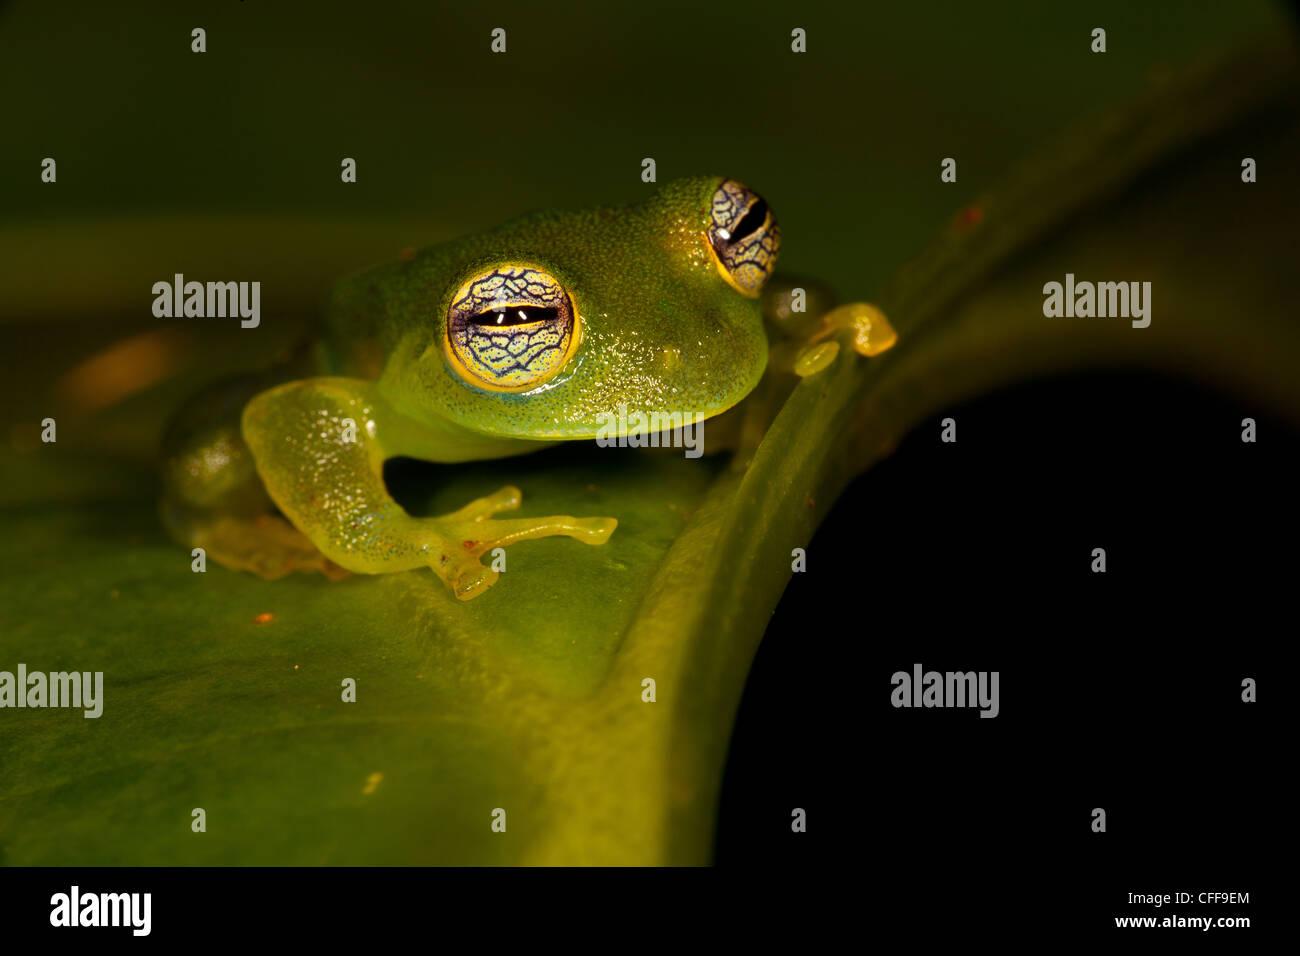 Glass frog, Cochranella spinosa, in the rainforest at Burbayar, Serrania de San Blas, Panama province, Republic - Stock Image